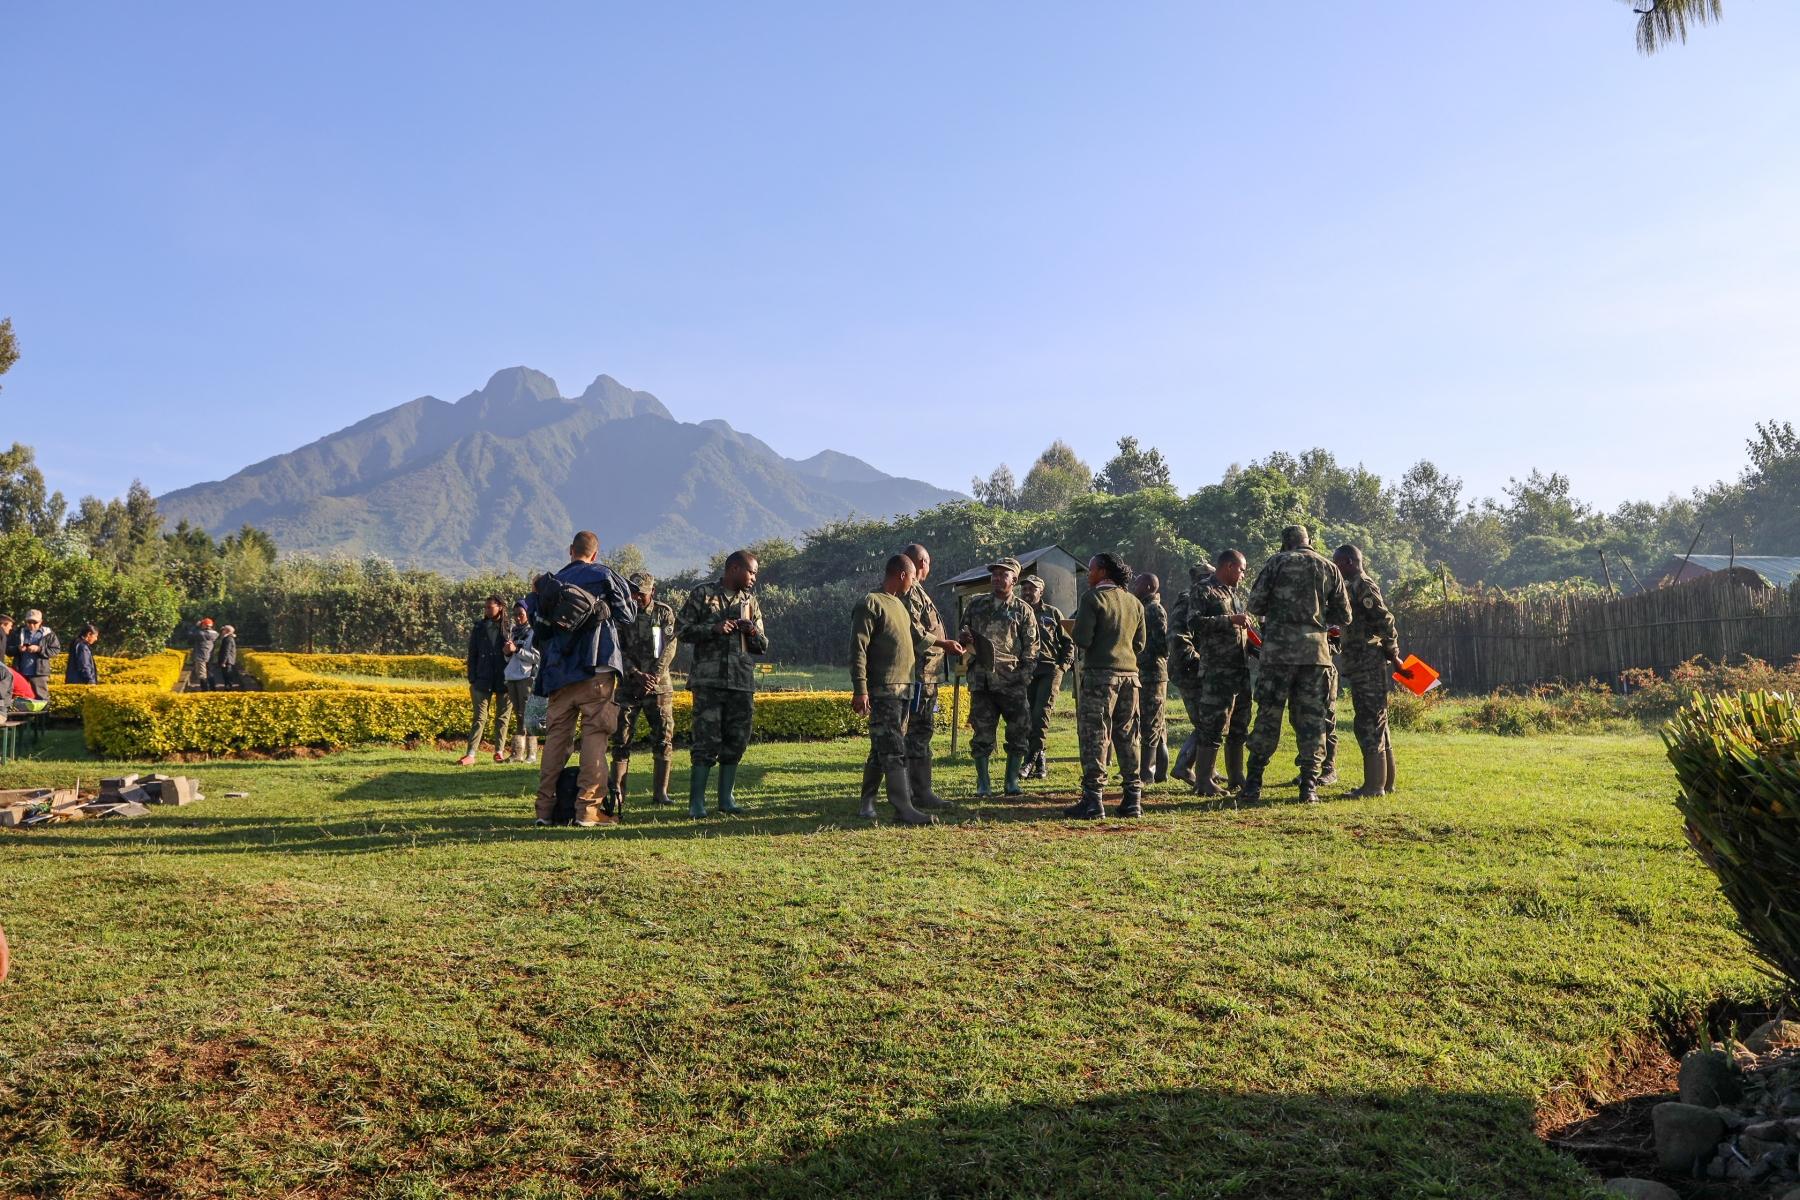 Rwanda-Gorilla-Trekking-Photo-Credit-Kate-Webster-176